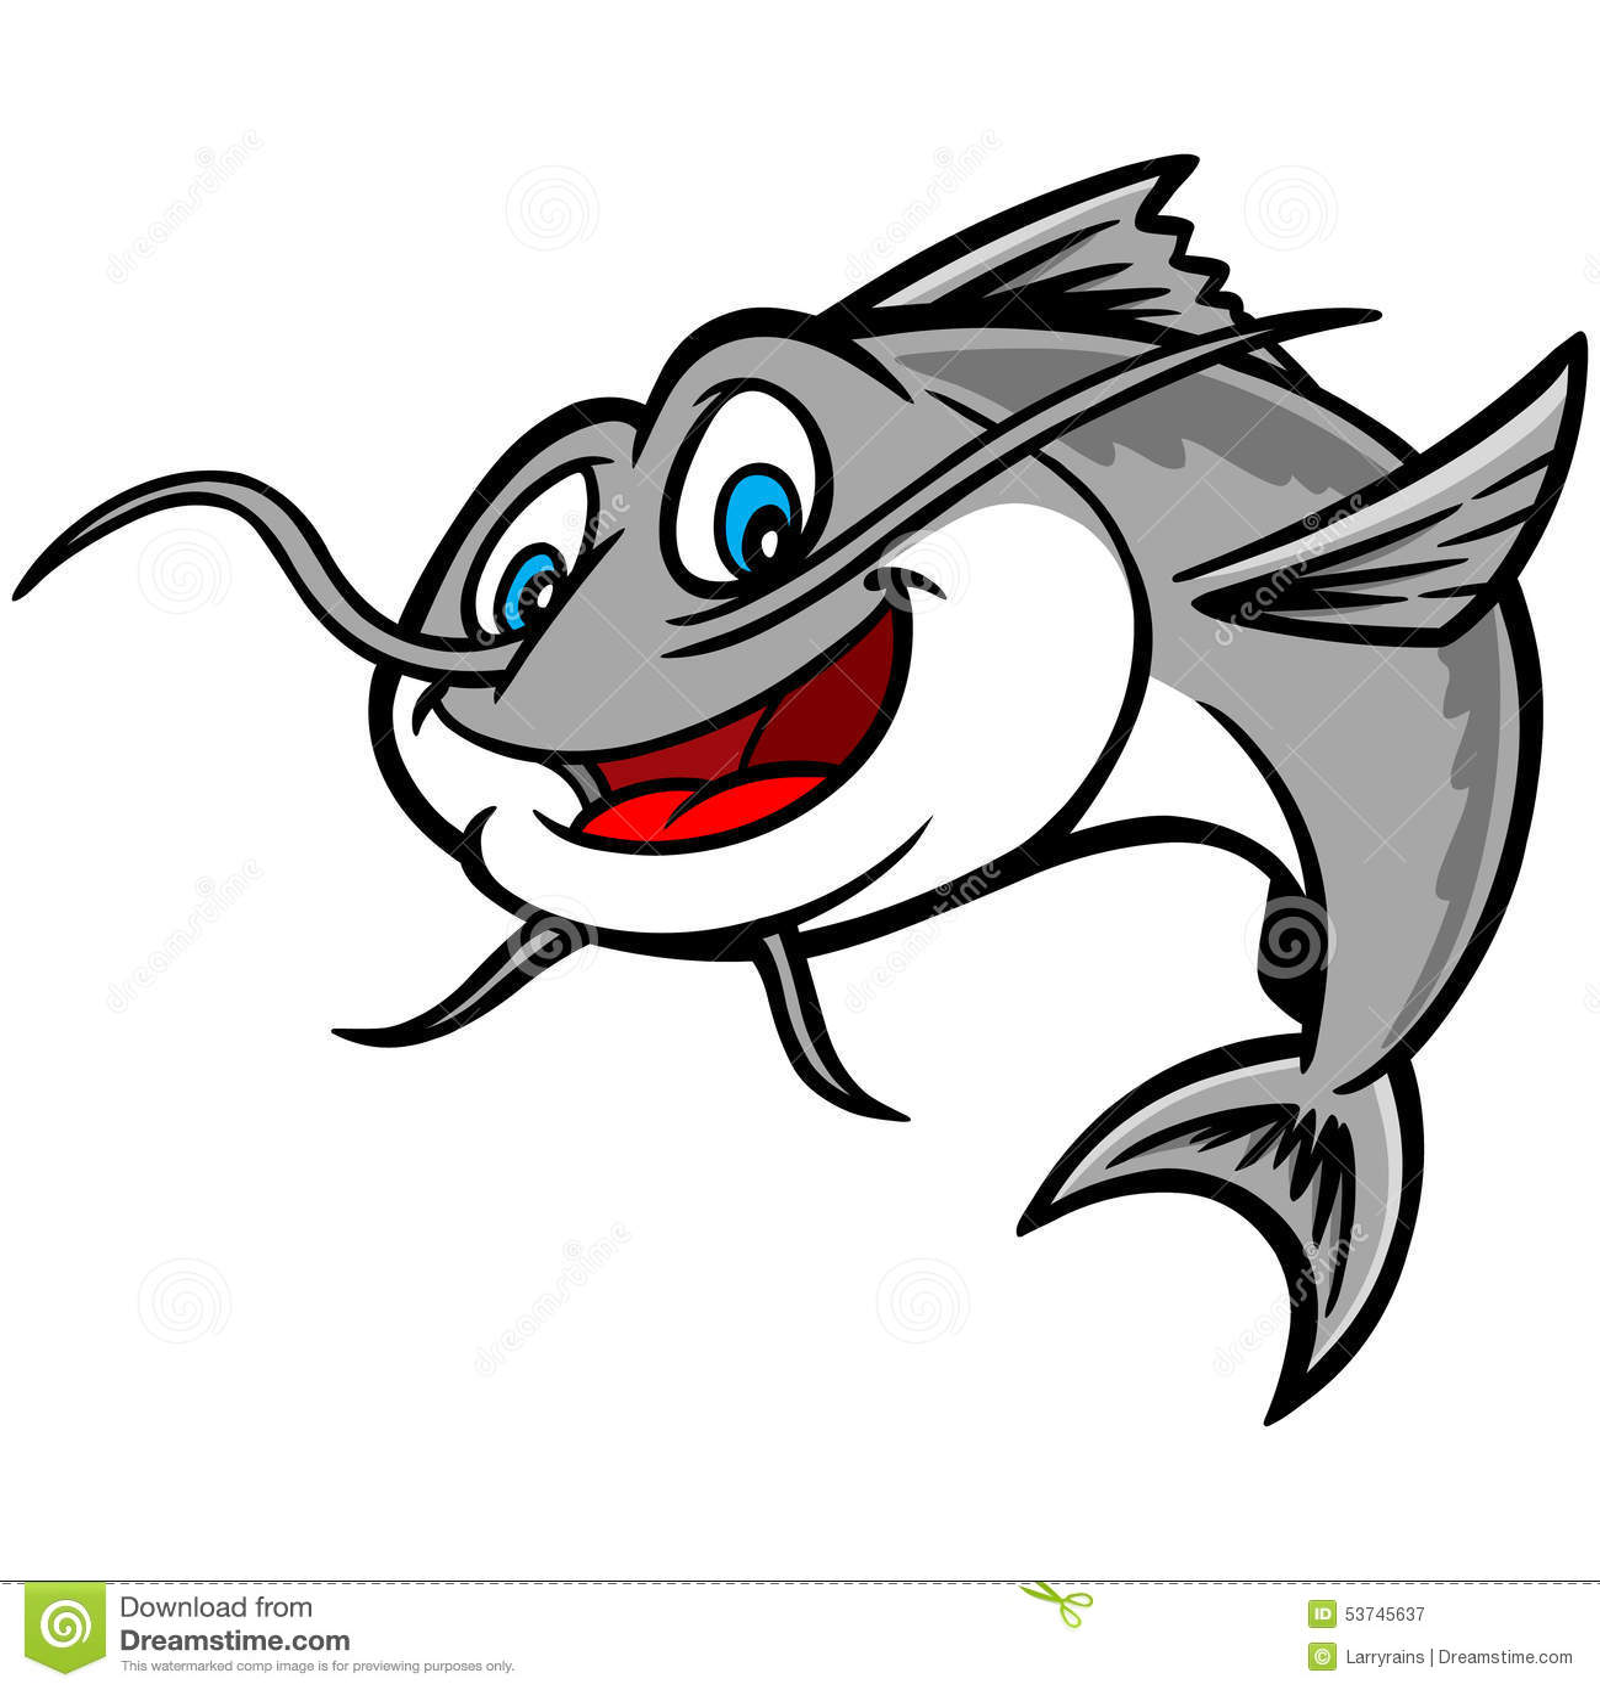 catfish stock vector image 53745637 catfish clip art black and white free catfish clip art images black and white